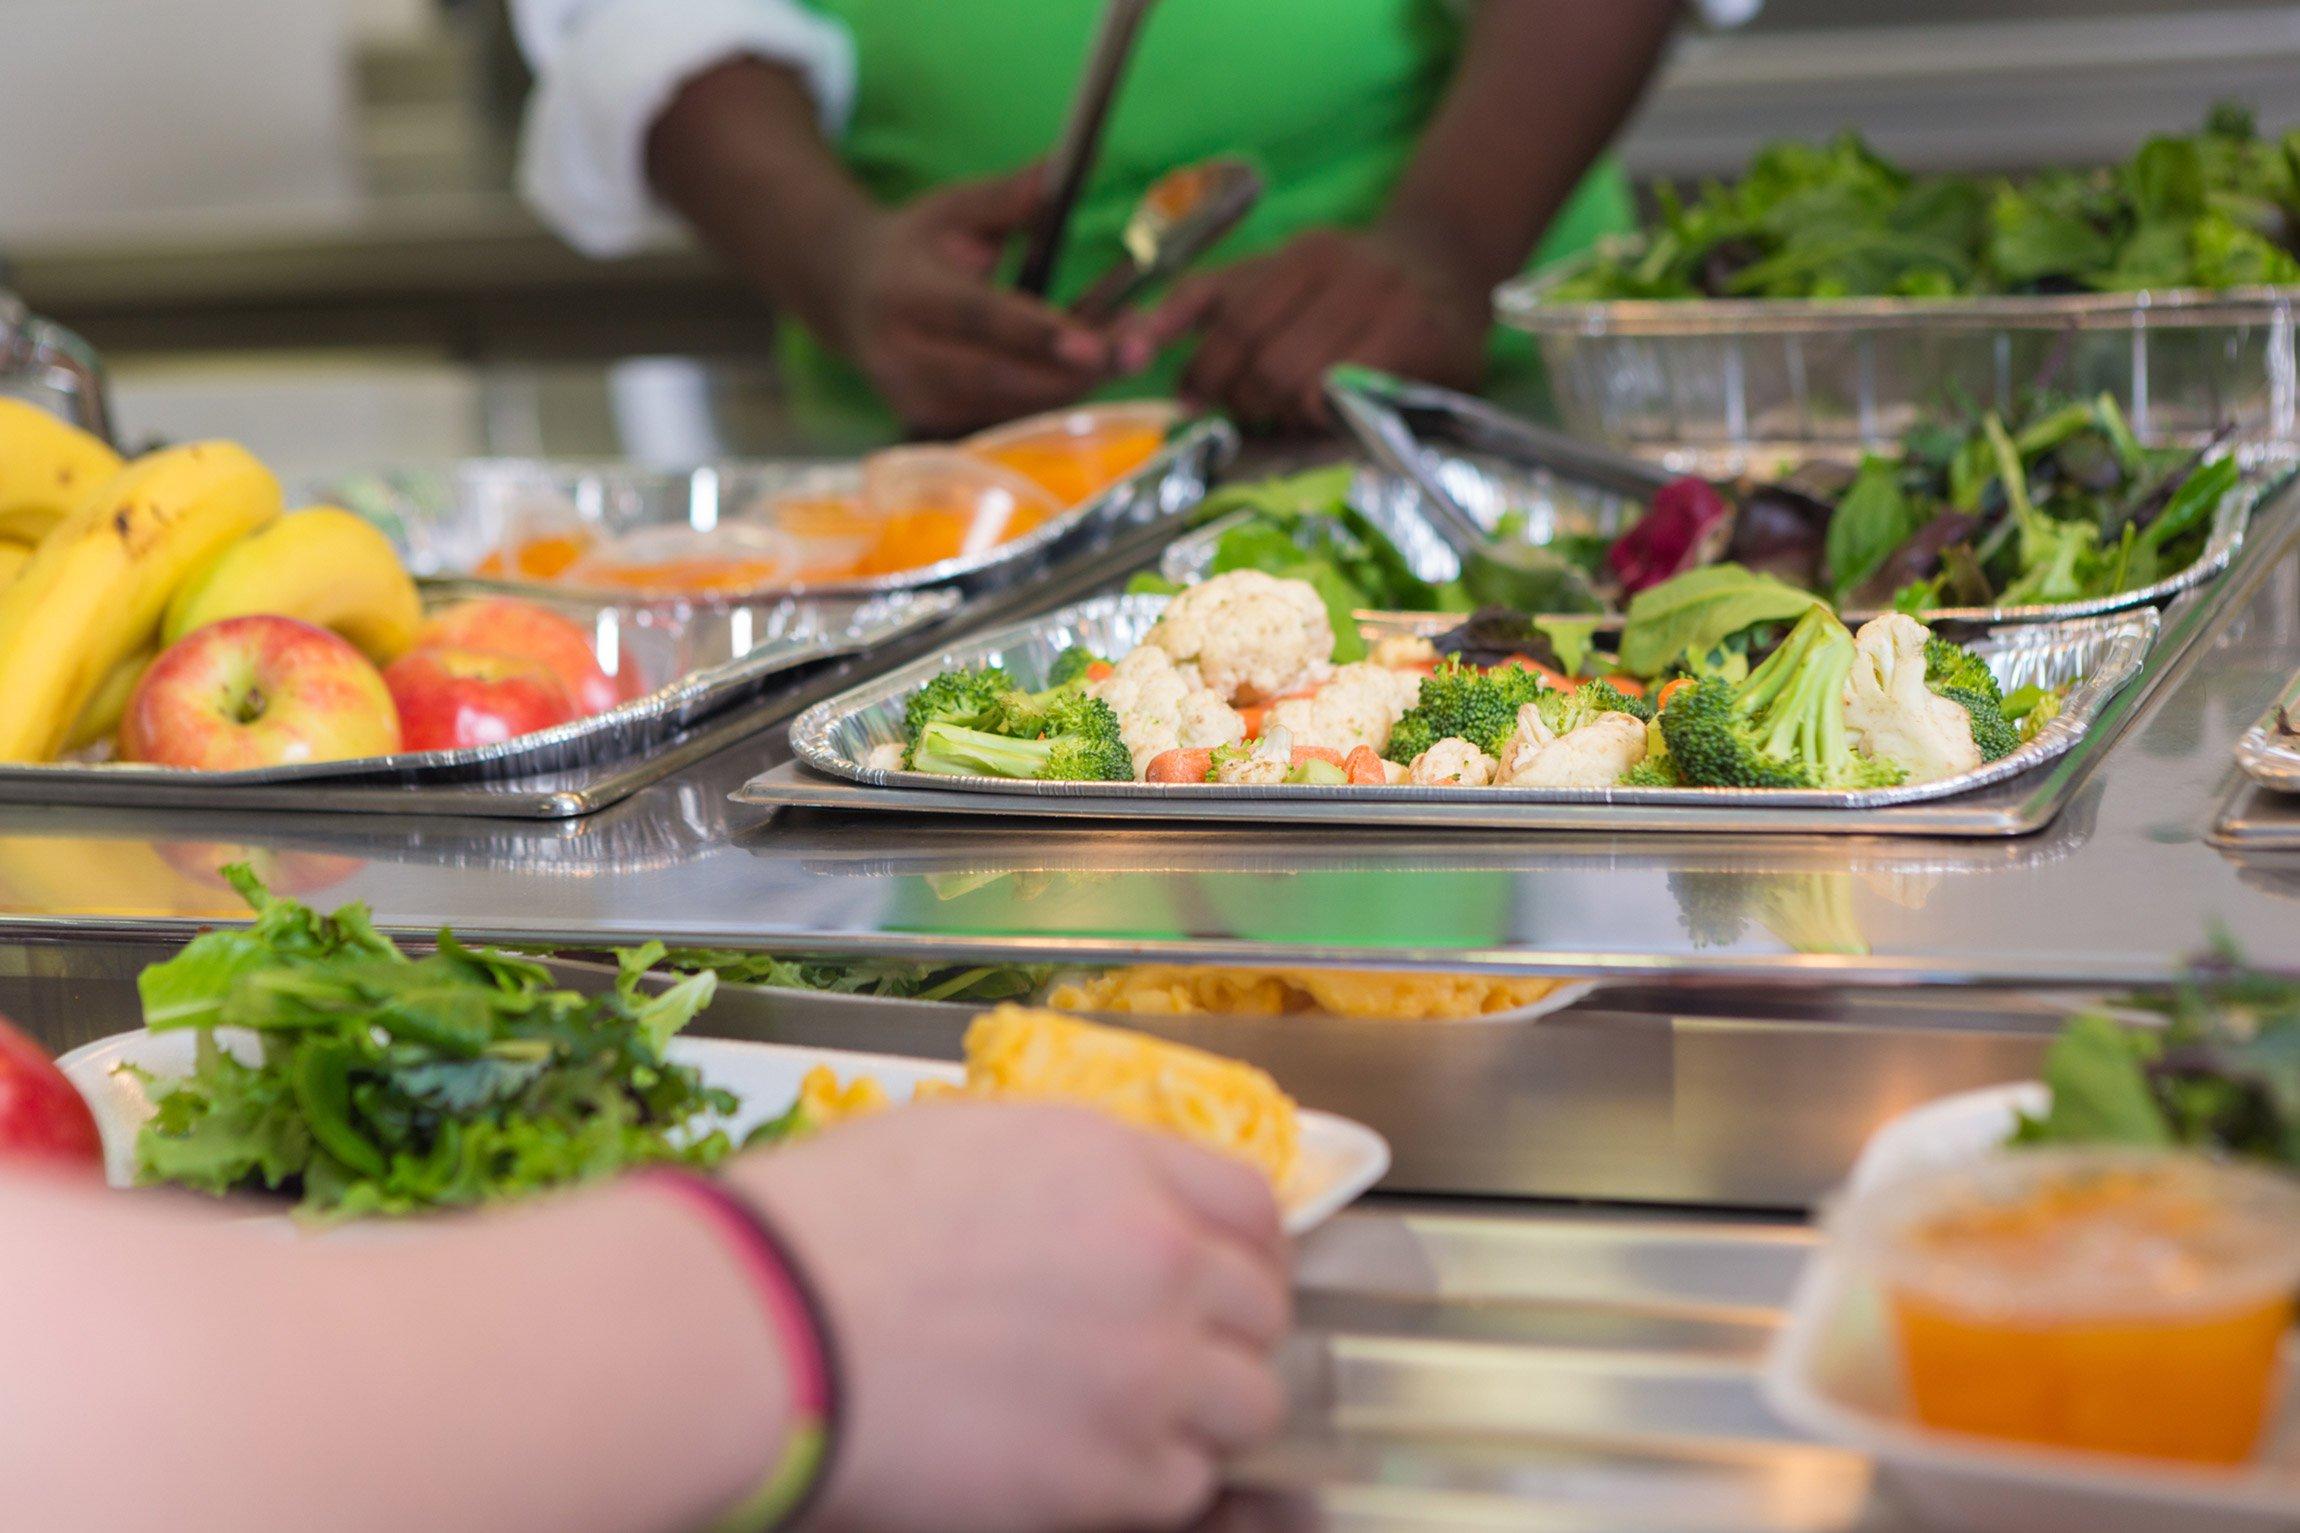 10 Ways School Lunch Is Improving (Plus Healthy School Lunch